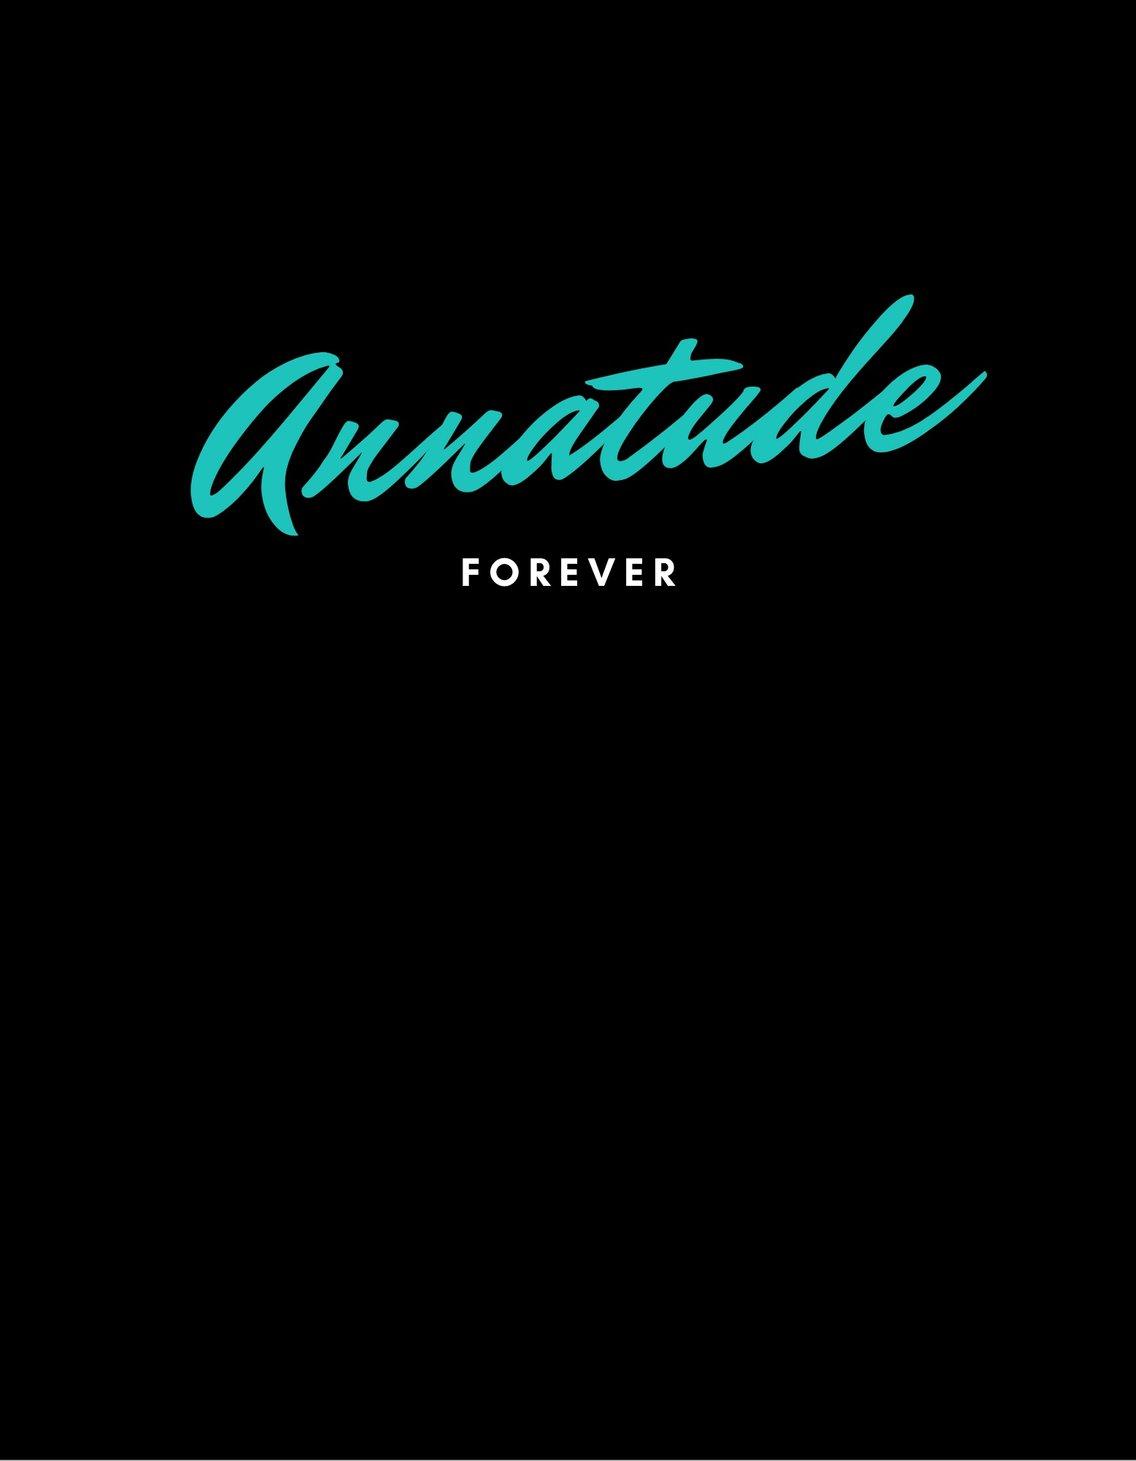 AnnaTude - immagine di copertina